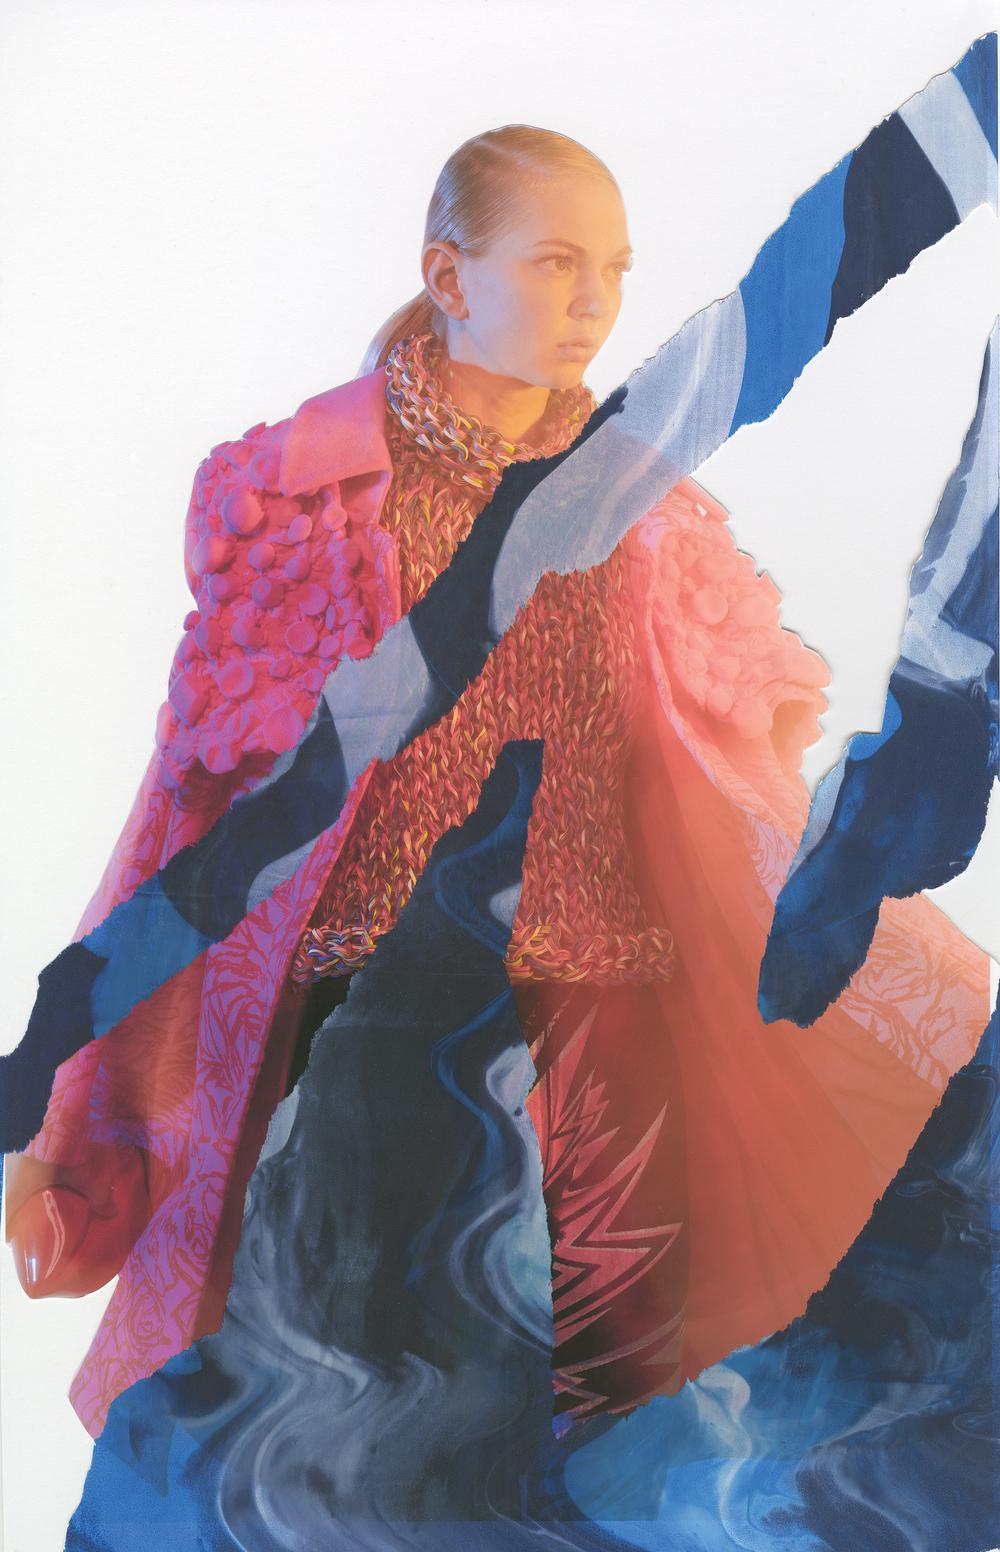 Leather hand-knit sweater by Jinhyun Kim, MFA Fashion Design. Coat by Jaci Hodges, MFA Fashion Design, and Nisha Hanna Btesh, MFA Textile Design. Leggings by Ben Copperwheat. Red Lip Clutch by Timmy Woods.